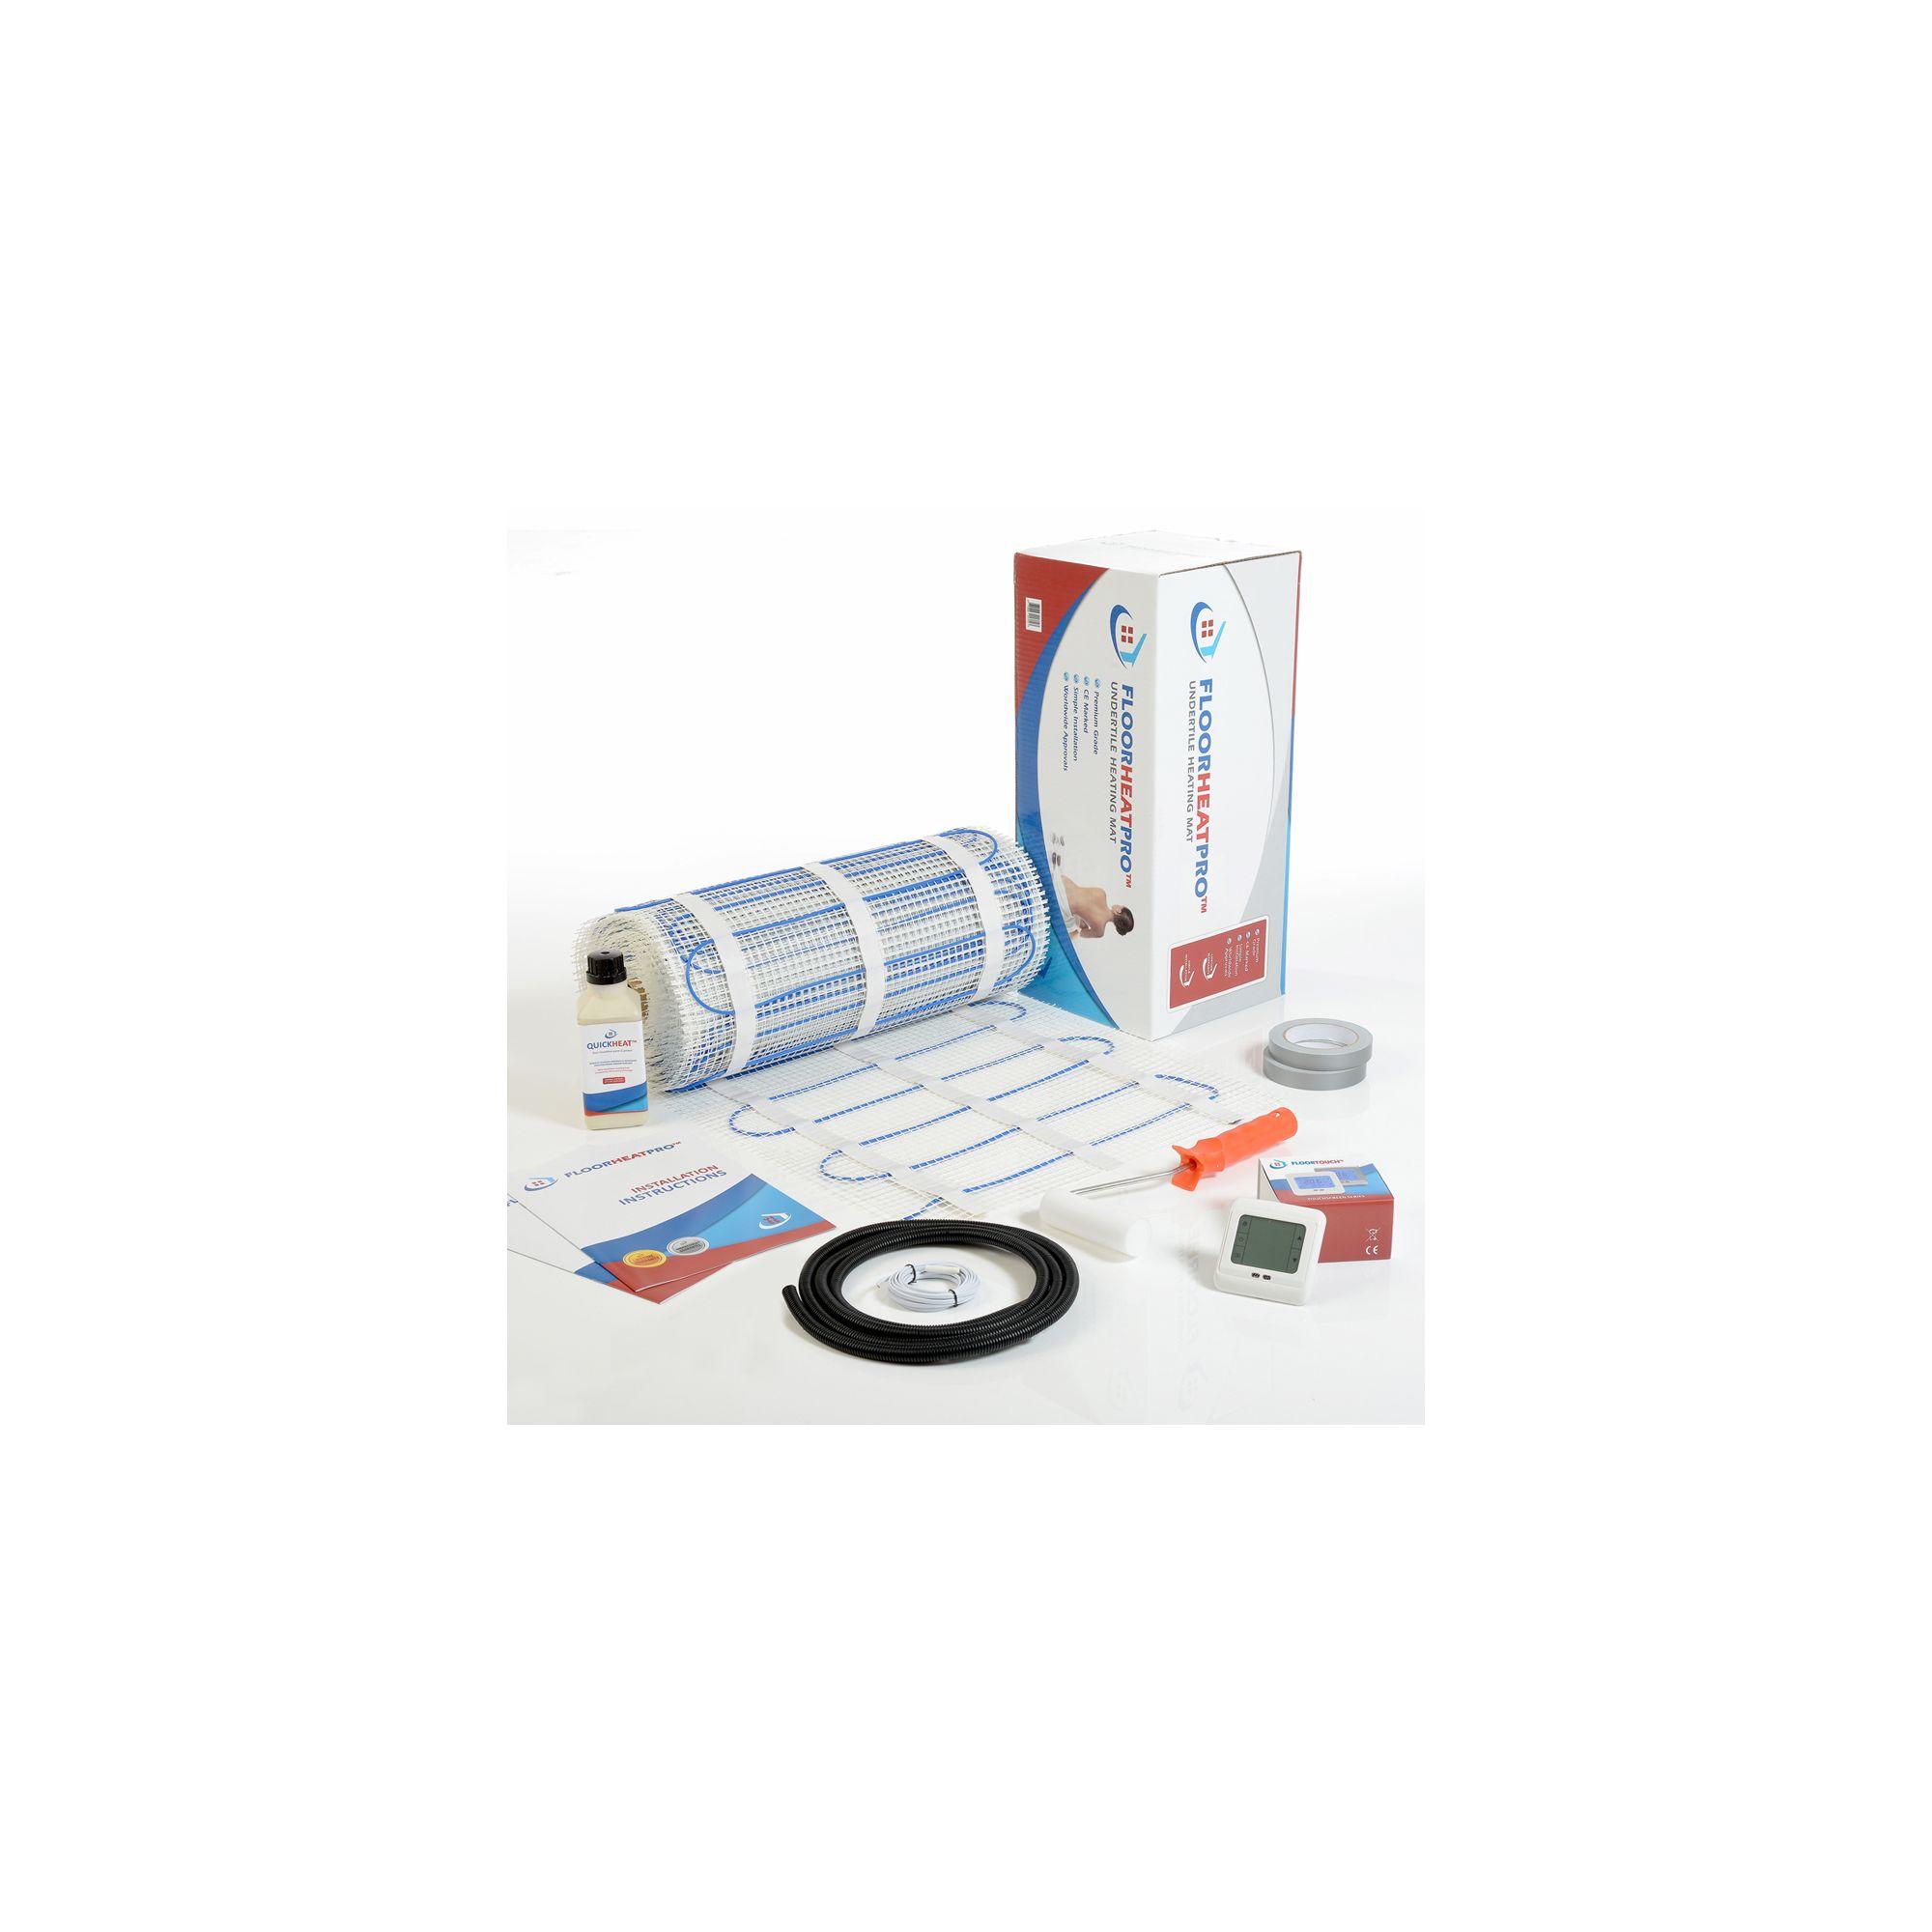 24.0m2 - Underfloor Electric Heating Kit 150w/m2 - Tiles at Tesco Direct